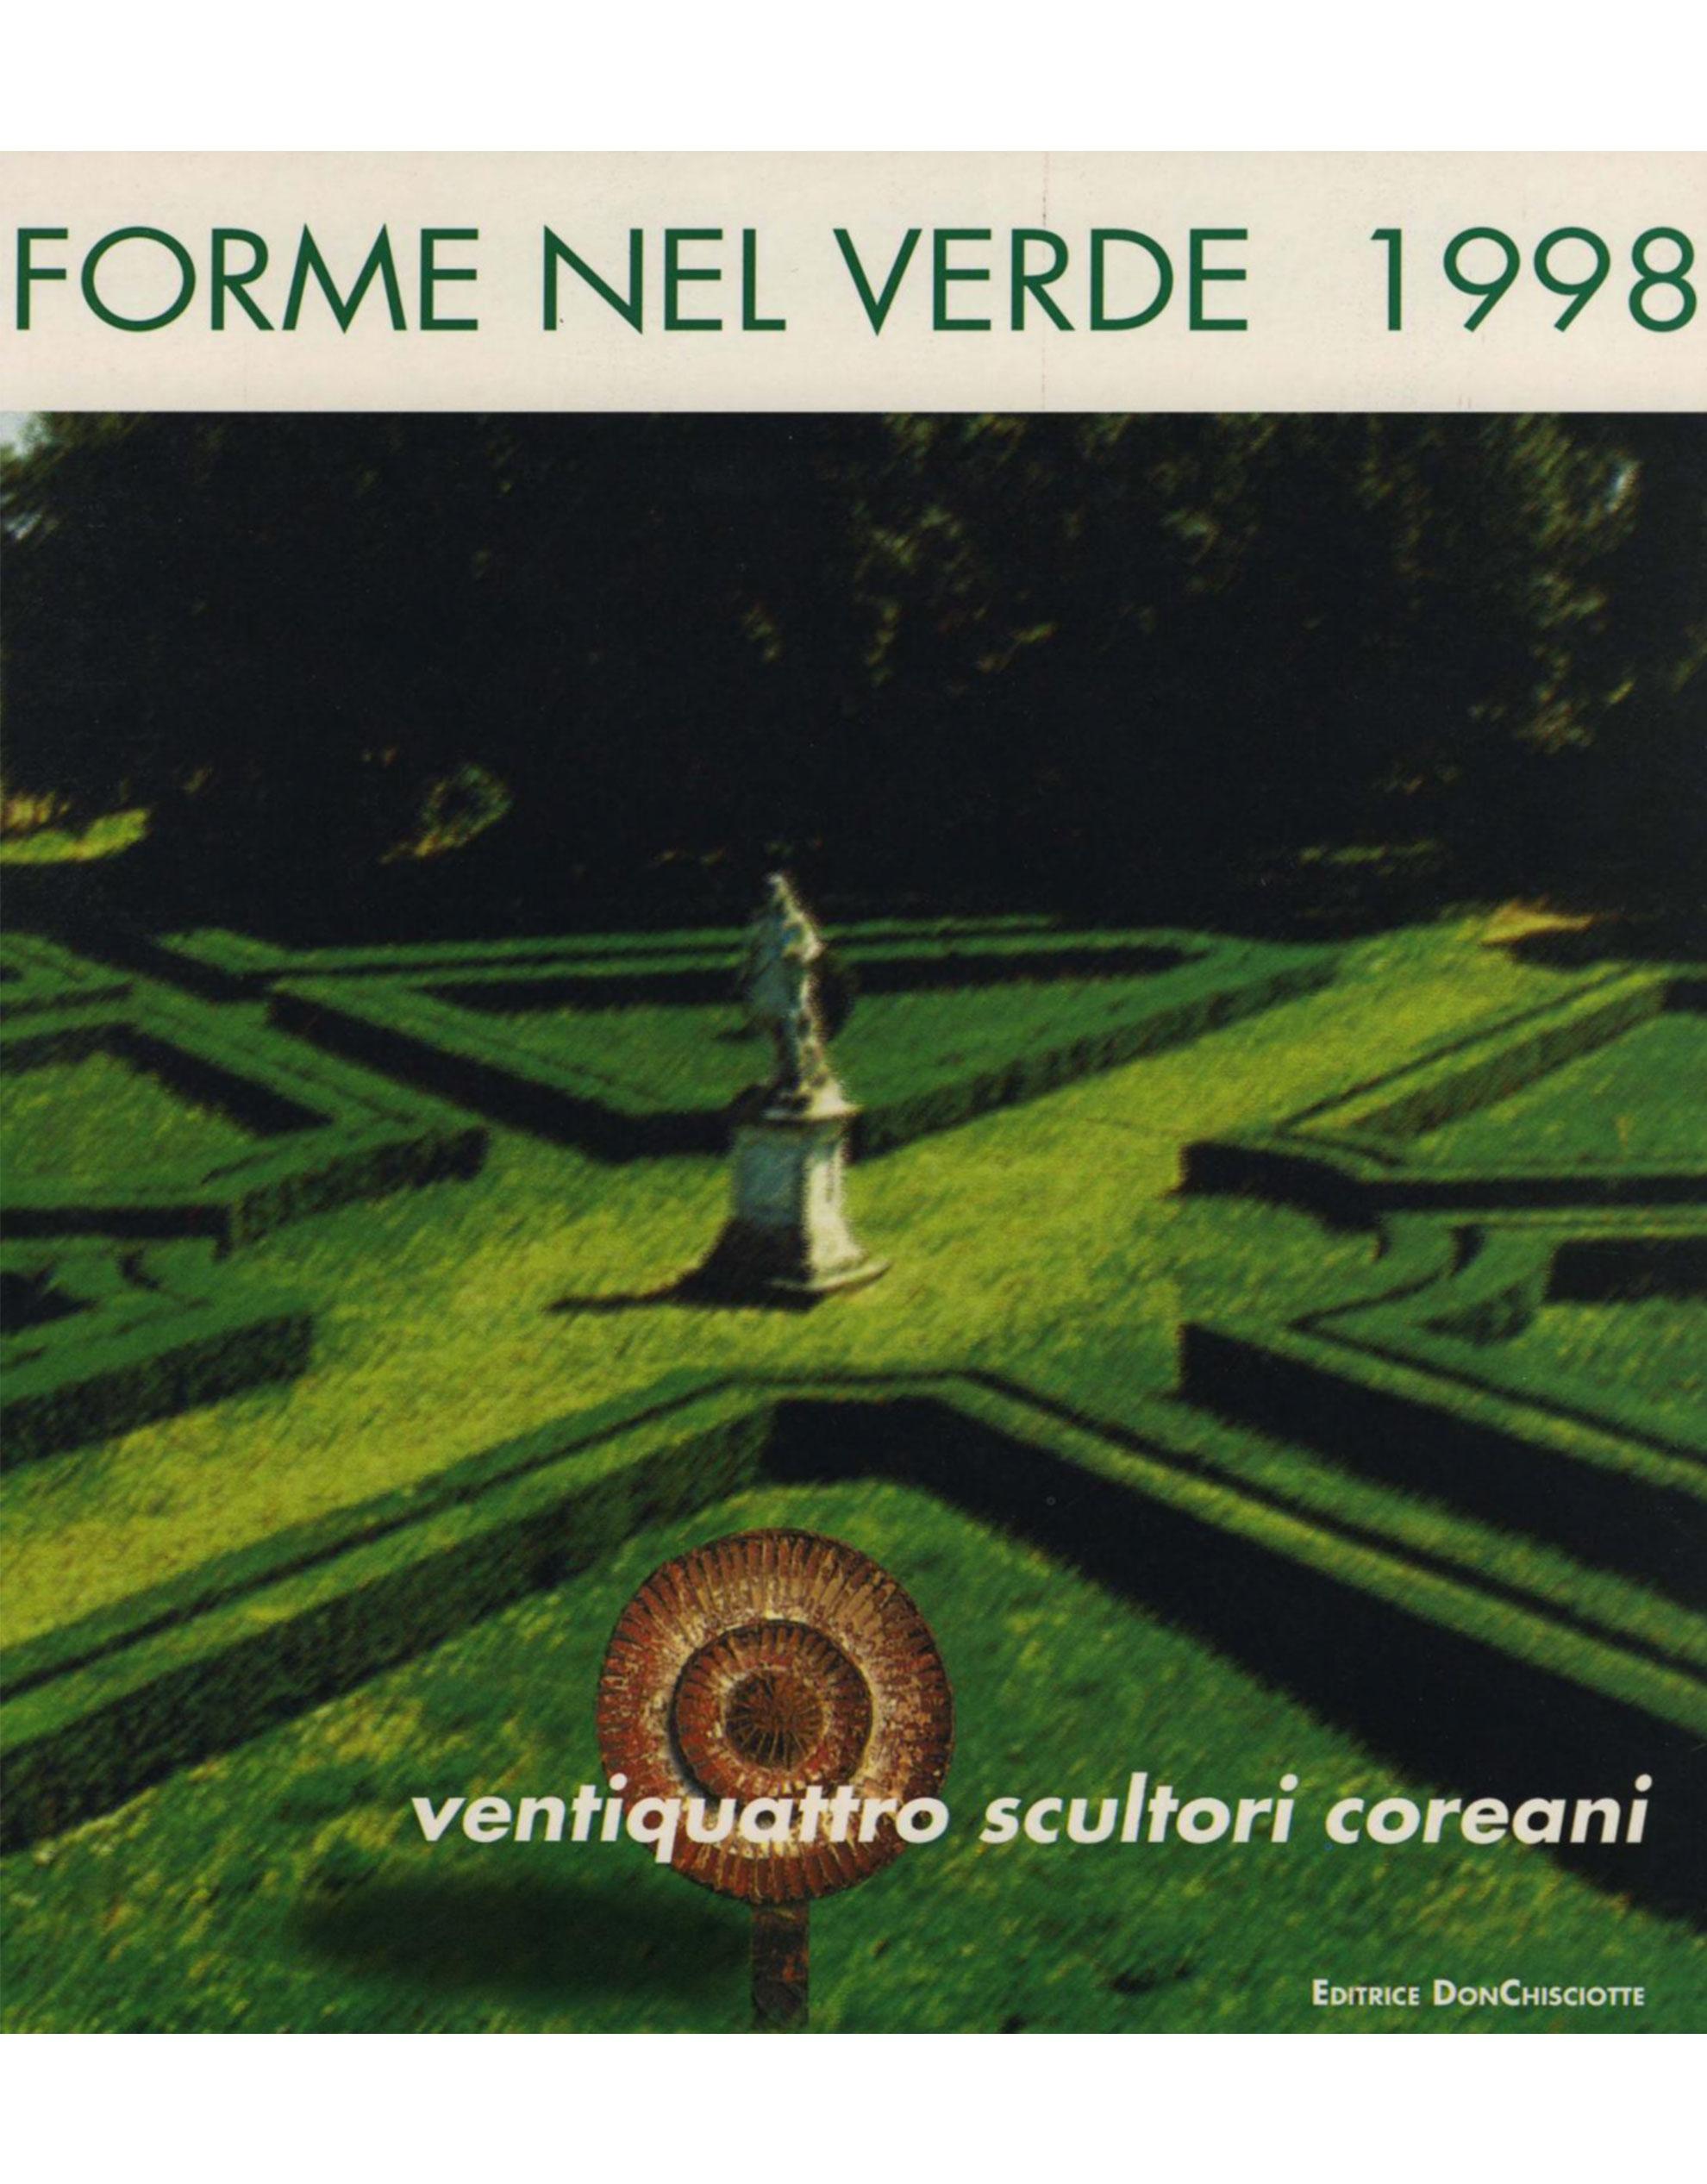 Catalogo Forme nel Verde 1998